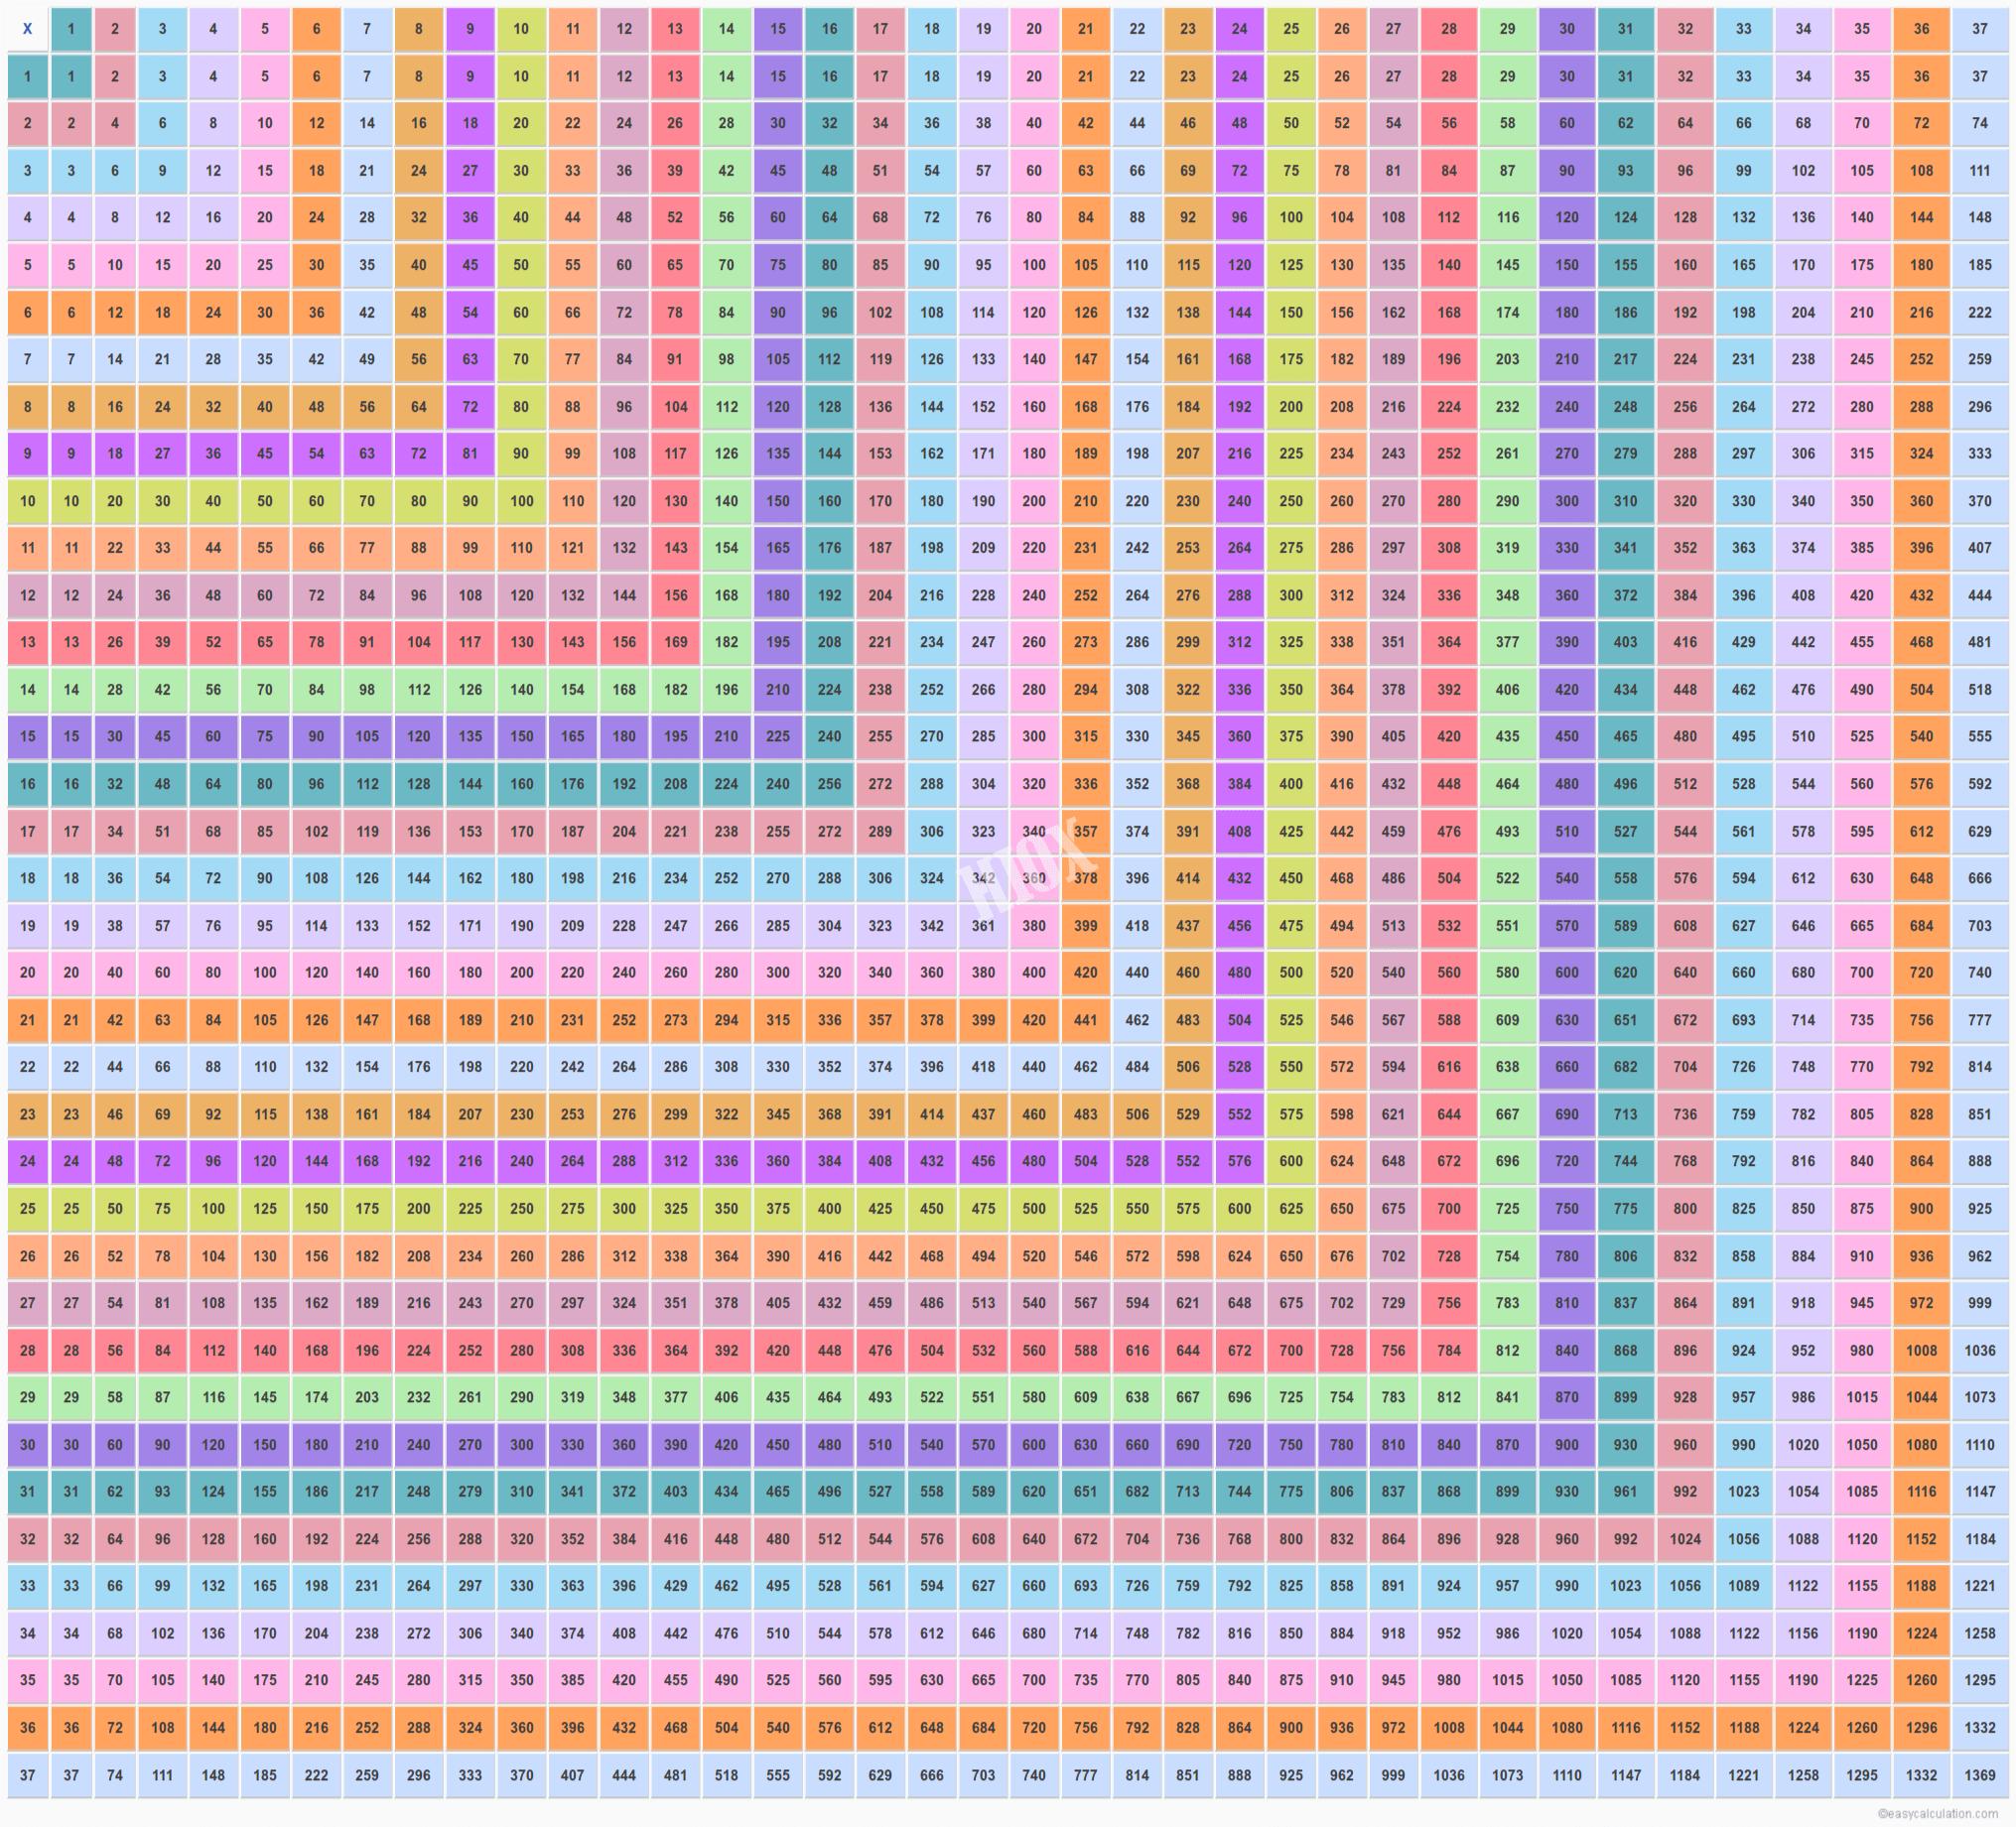 37 X 37 Multiplication Table | Multiplication Chart Upto 37